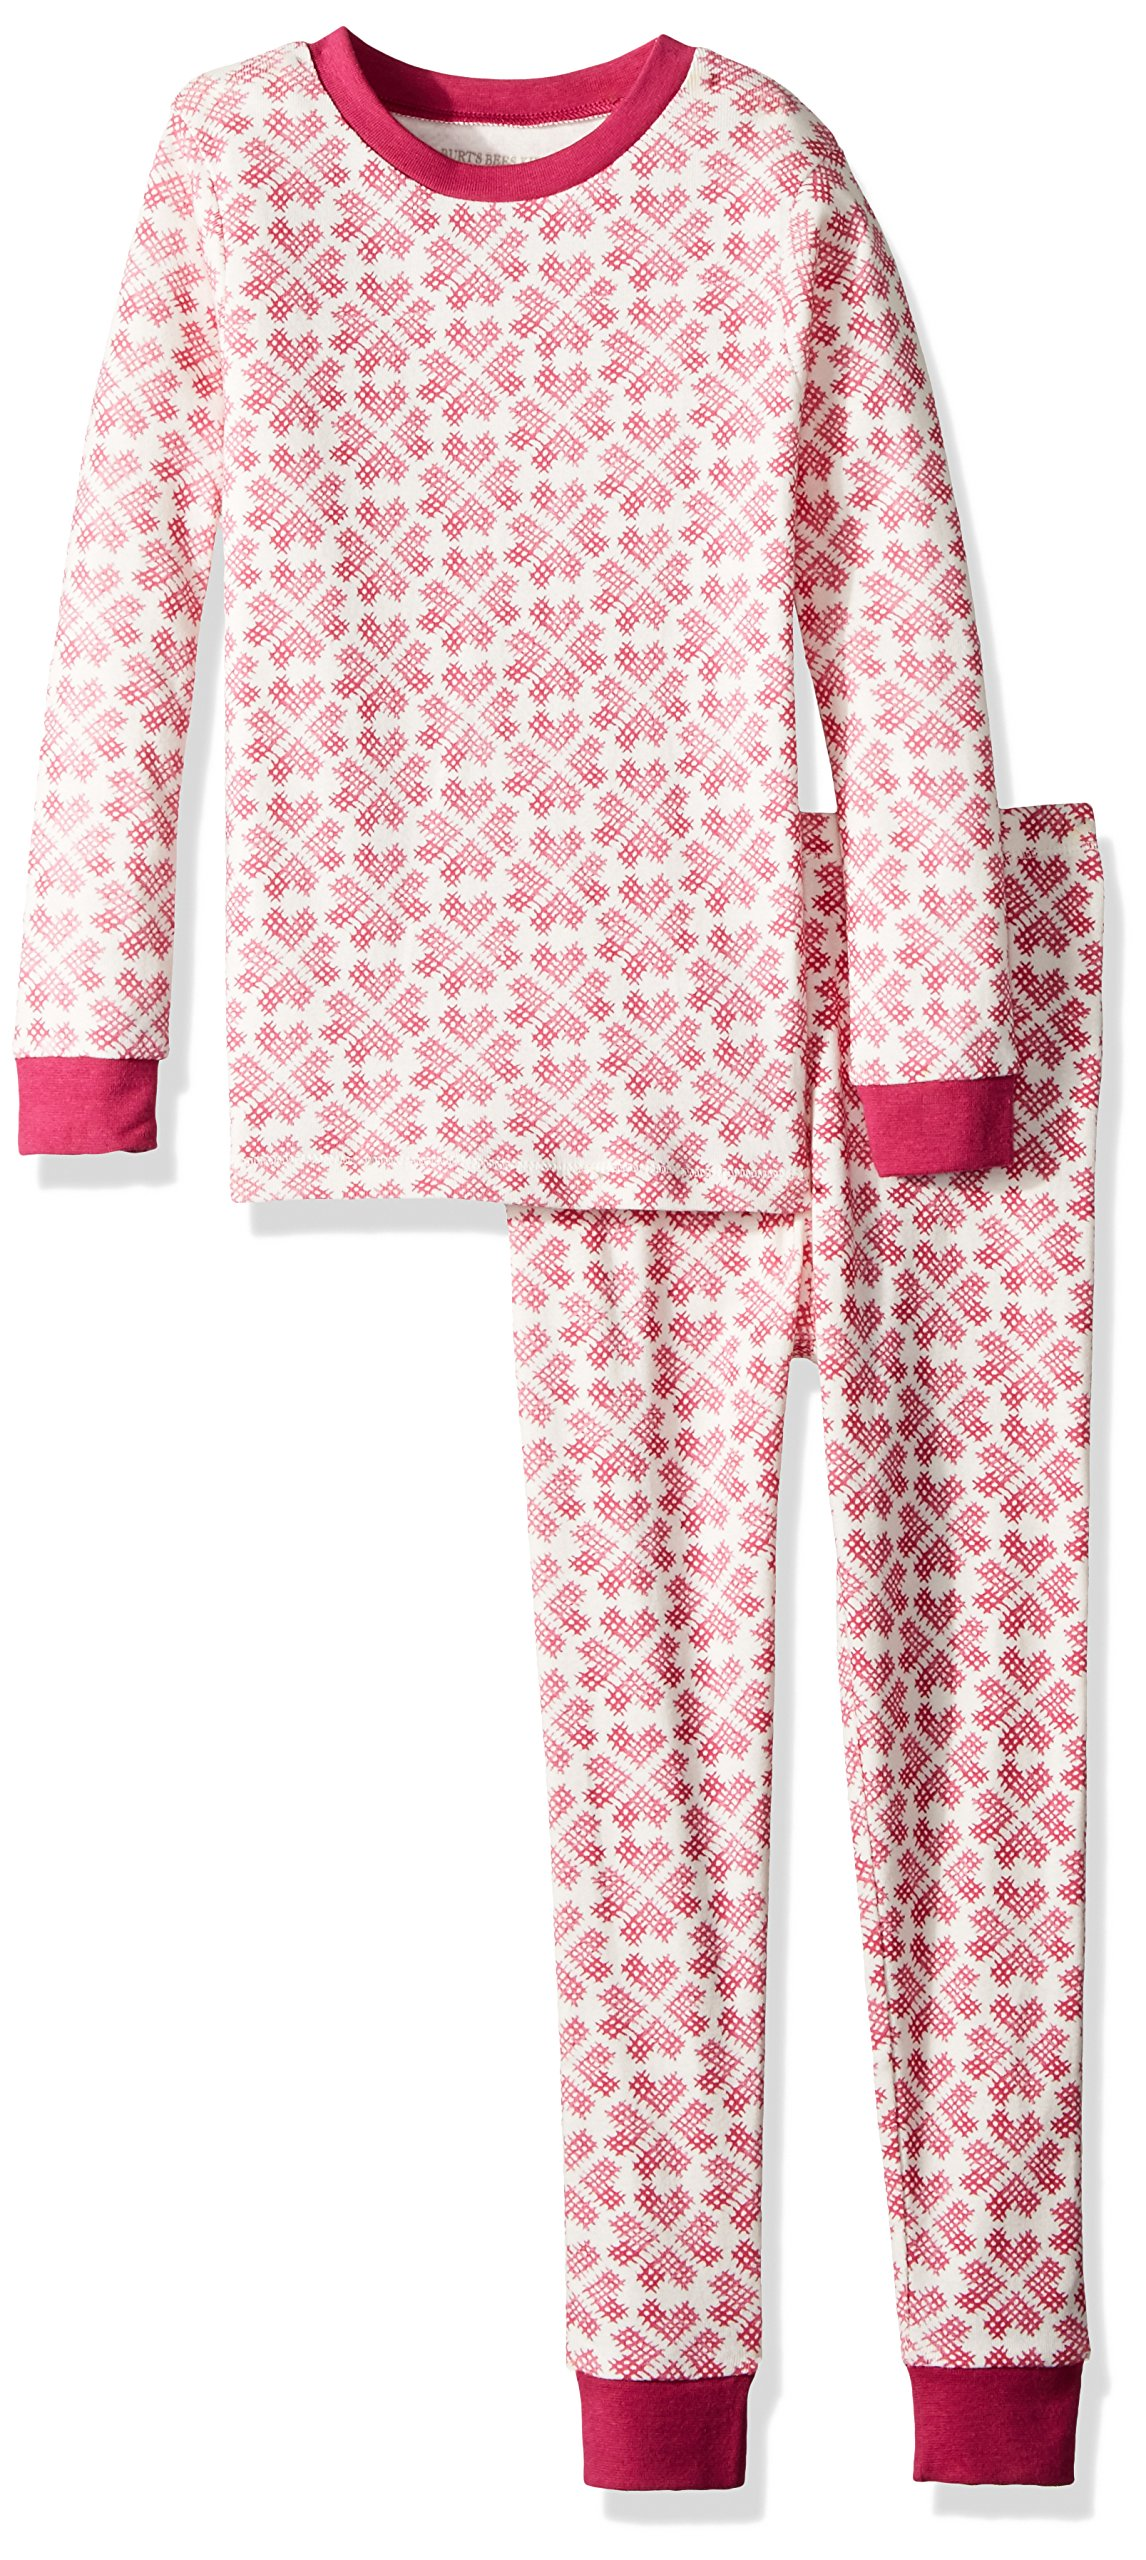 bfd0c3545f6d Galleon - Burt s Bees Baby Unisex Pajamas